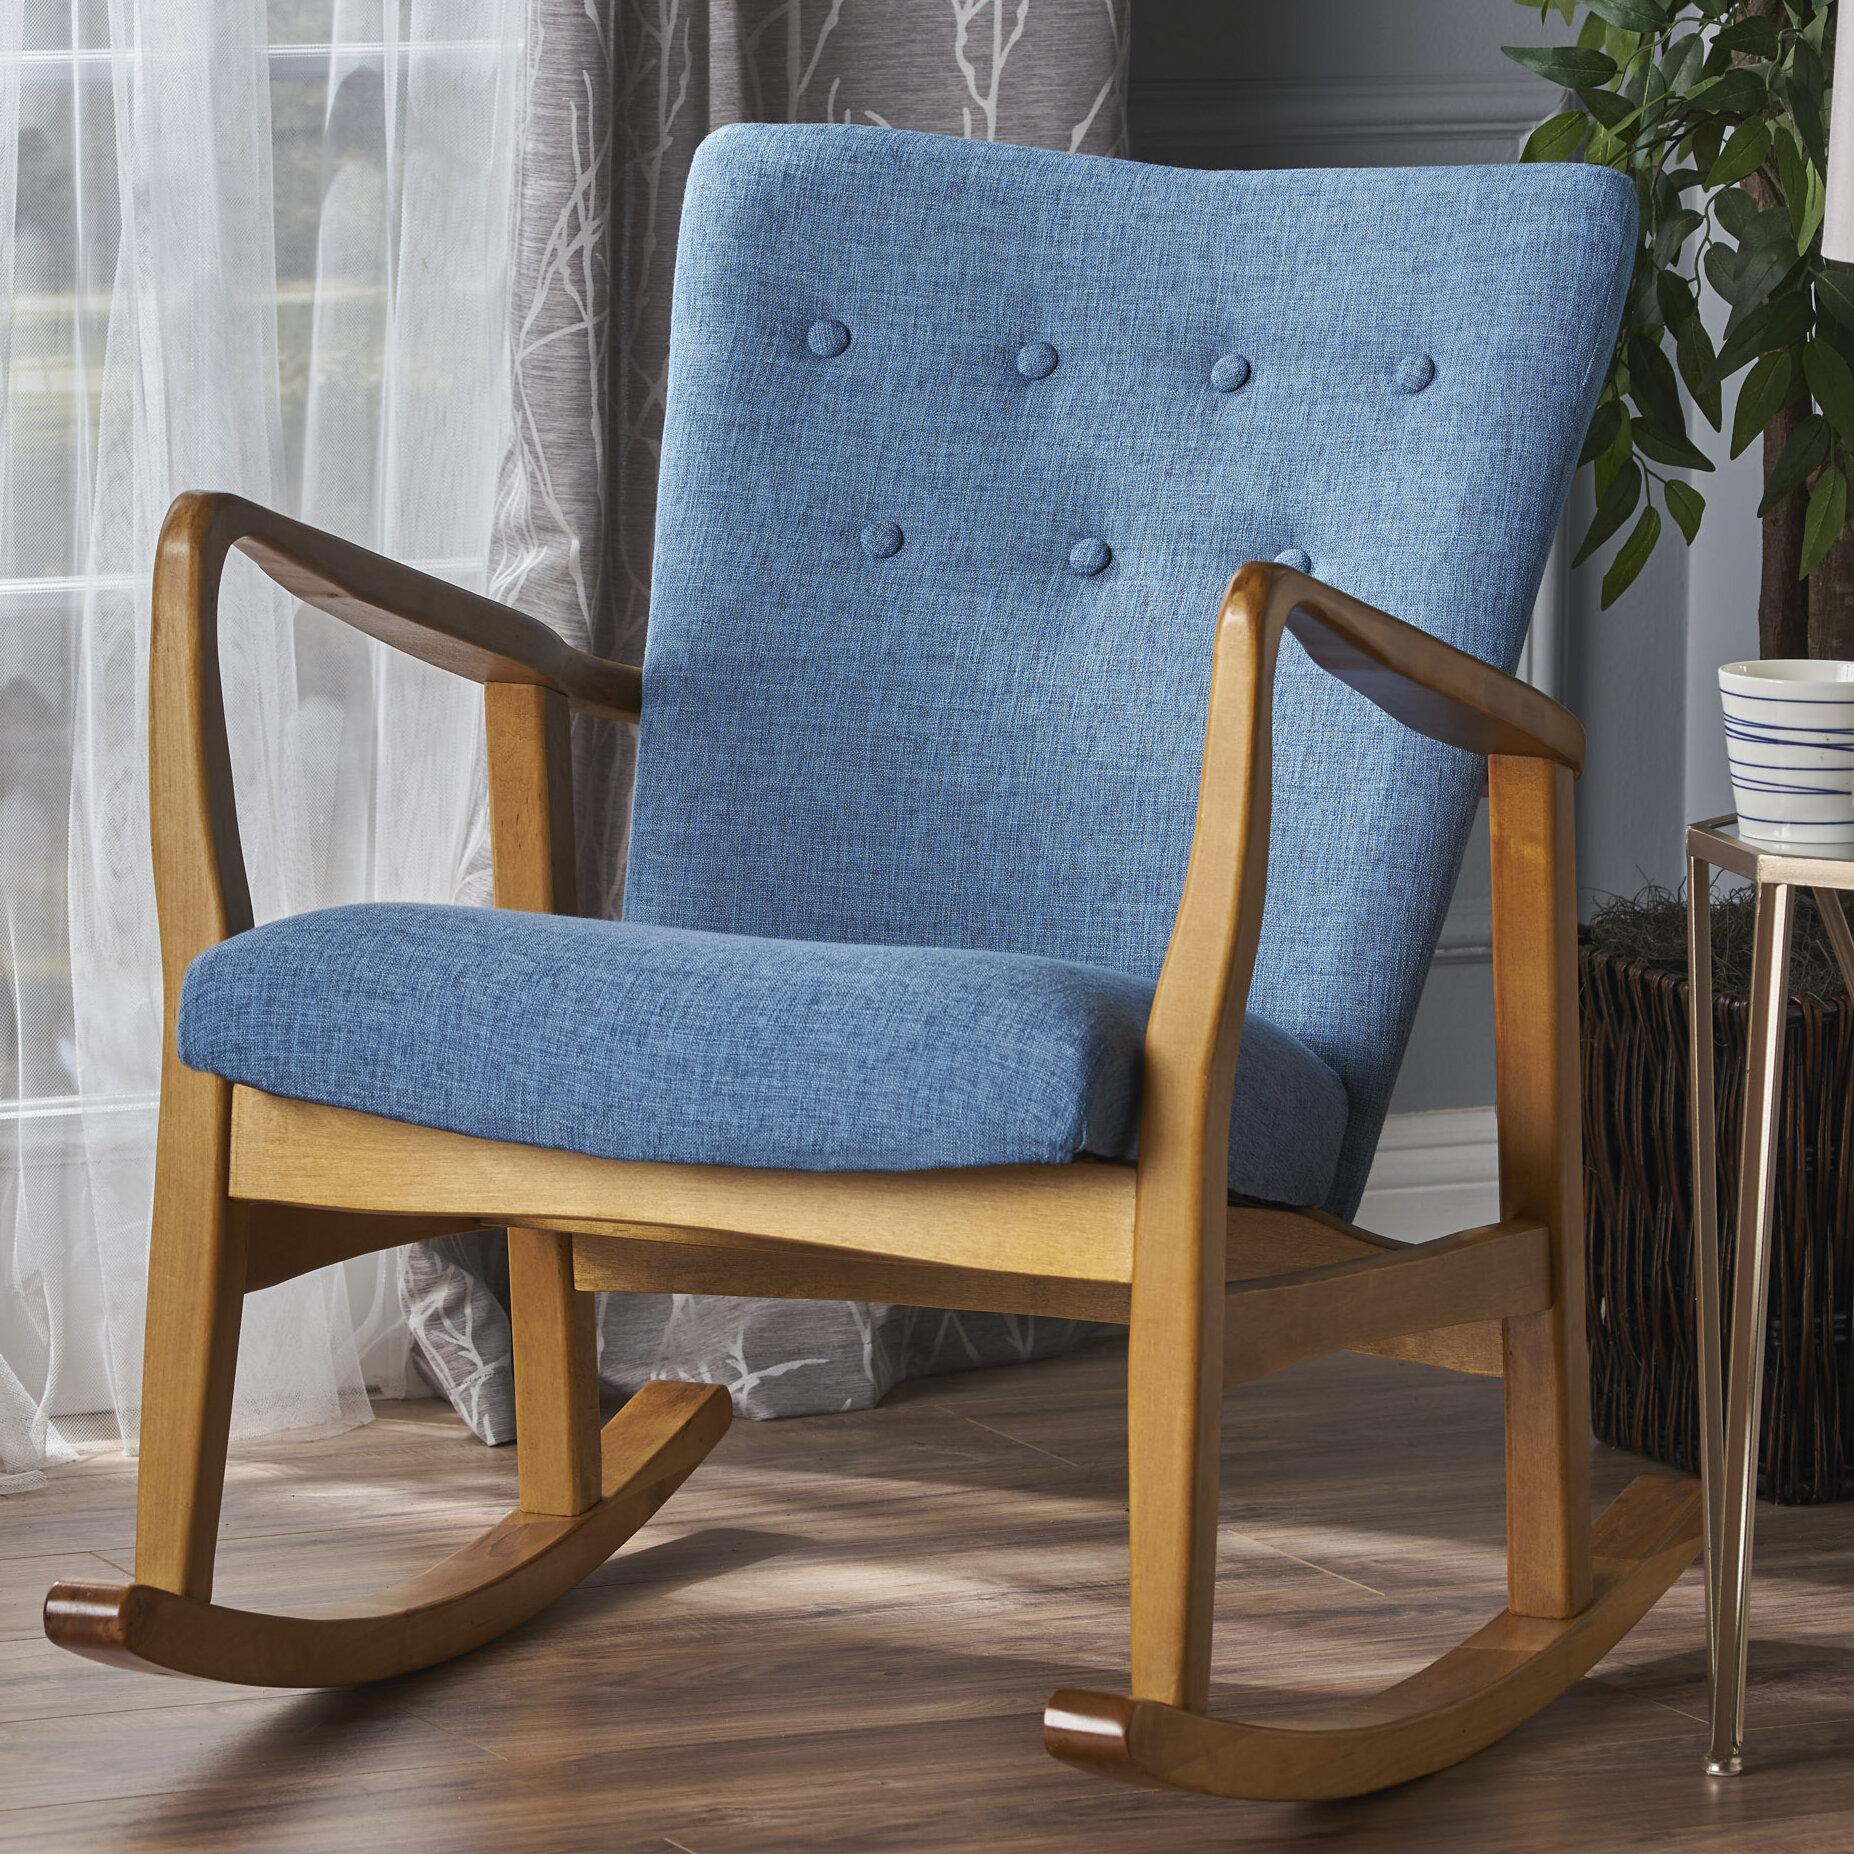 Superieur Brayden Studio Saulter Fabric Rocking Chair   Wayfair